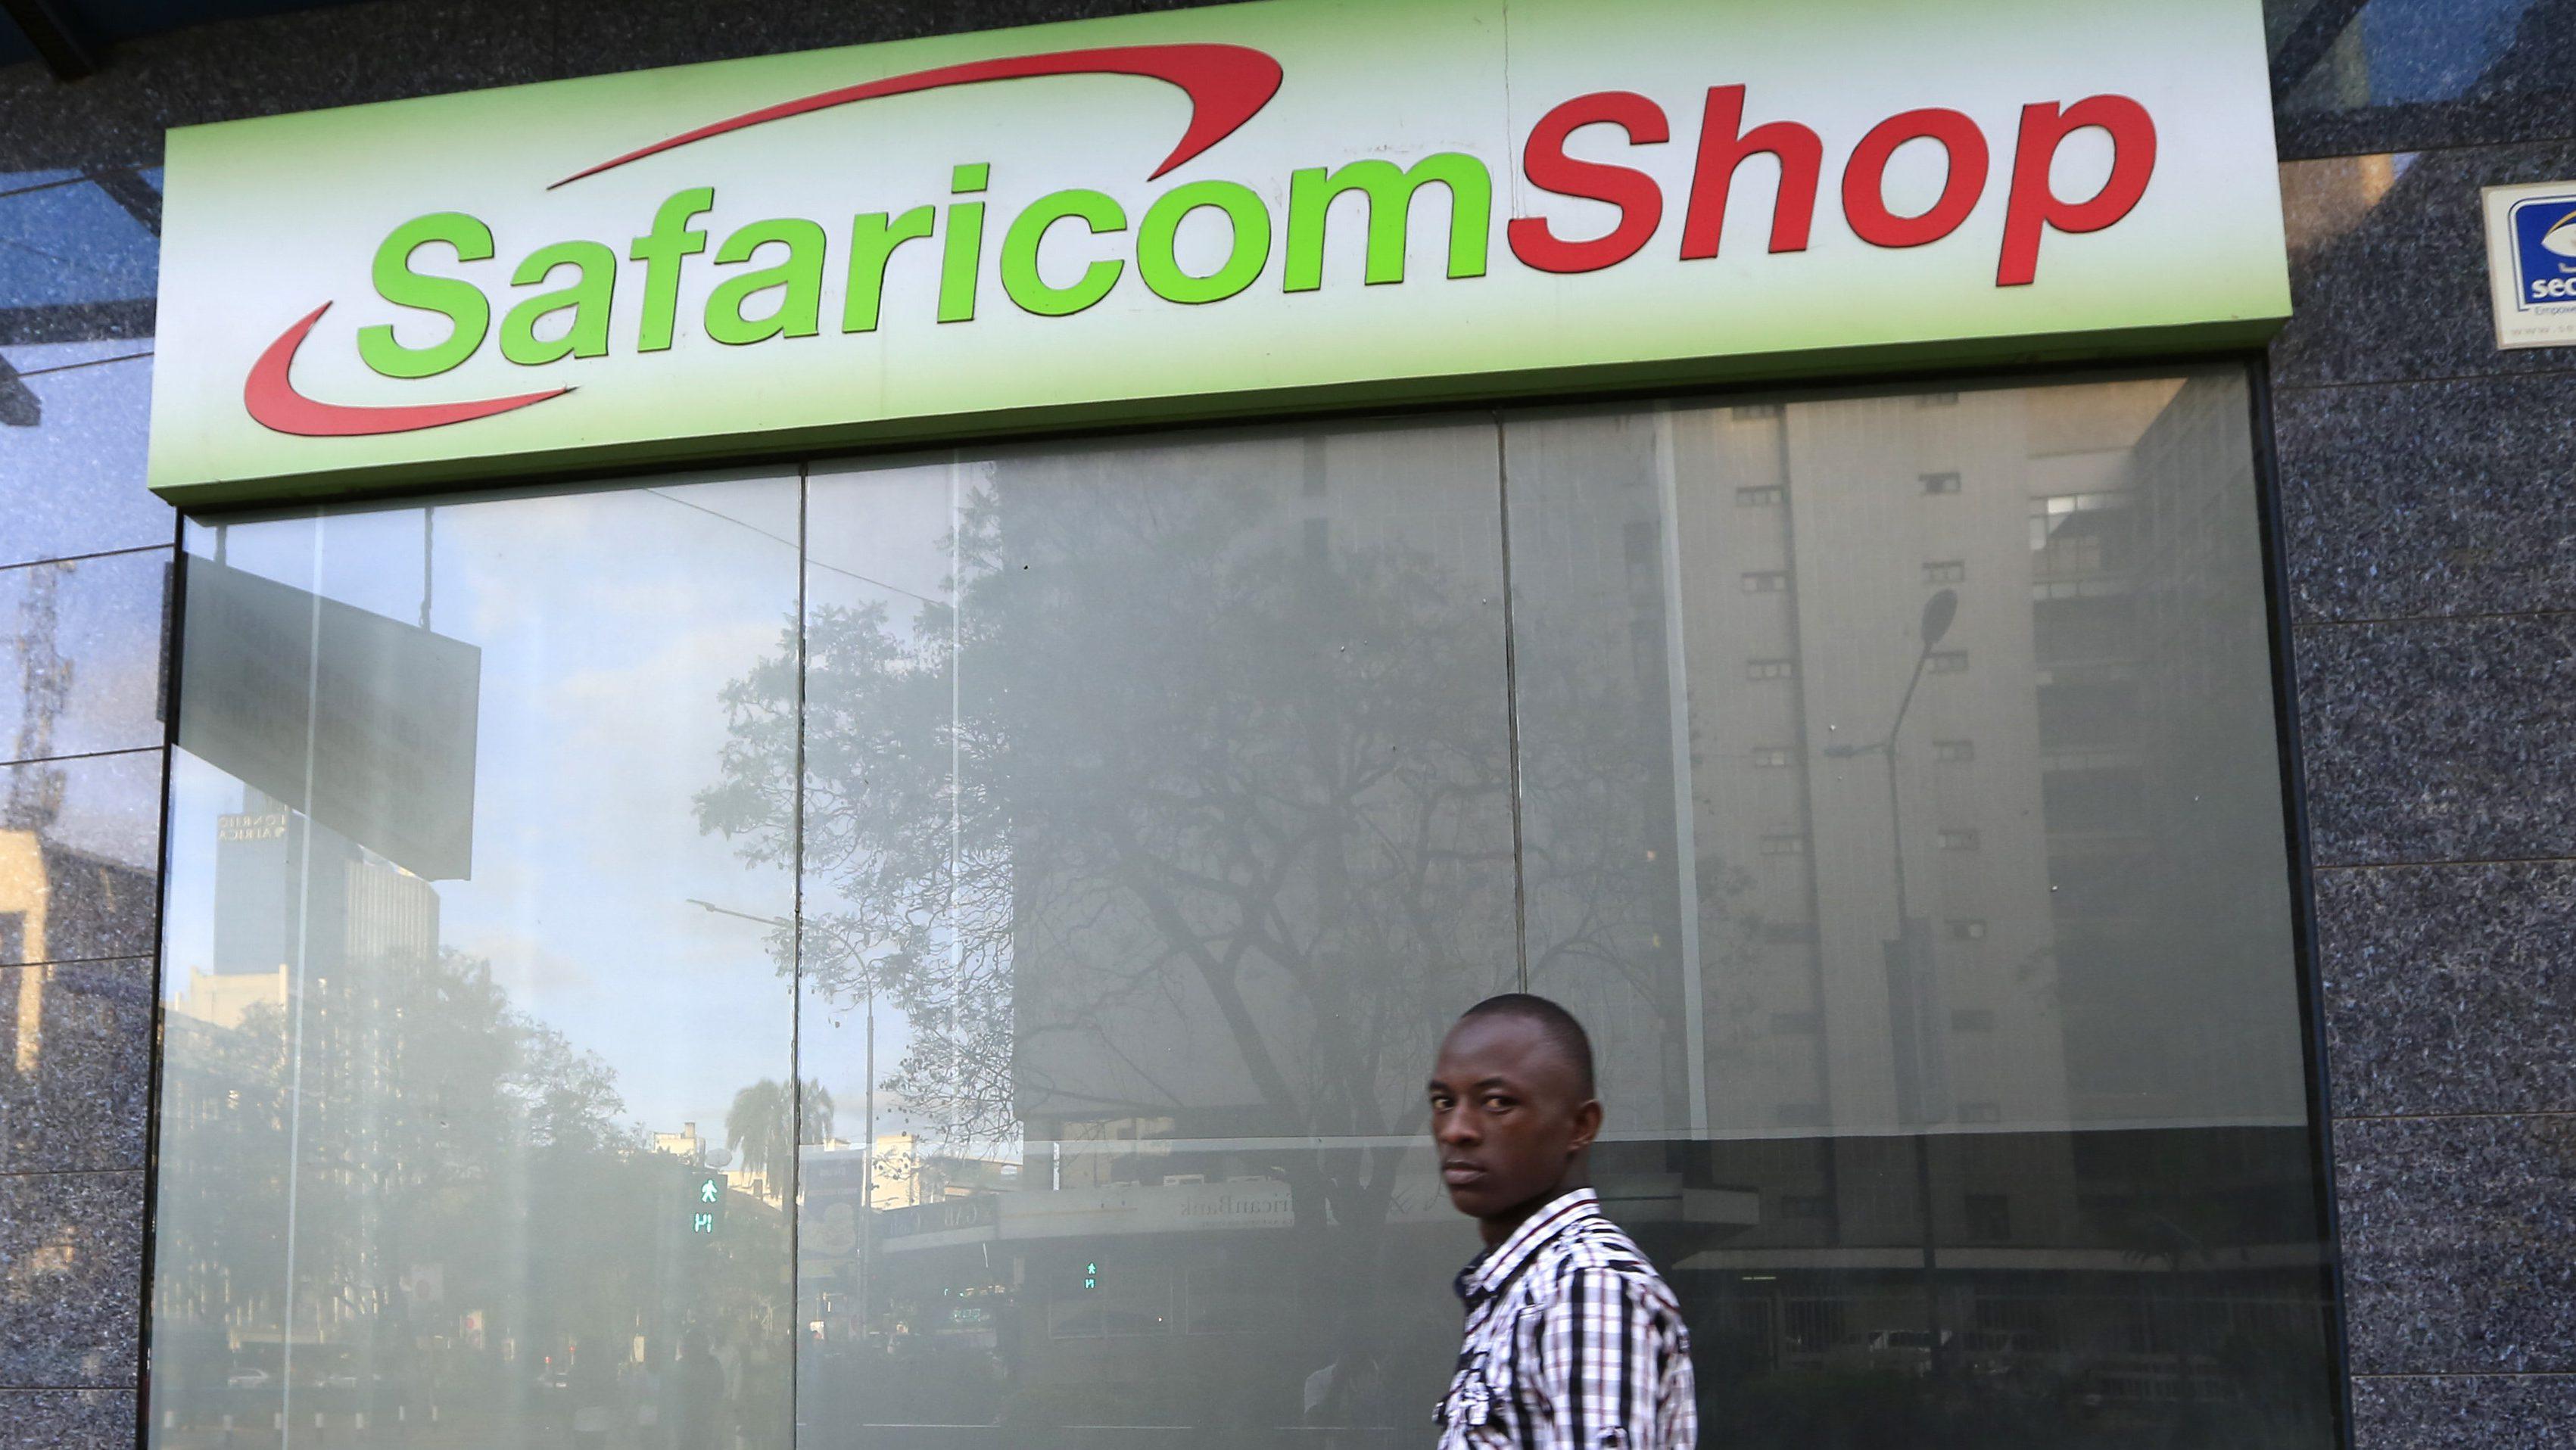 A man walks past a Safaricom shop, a mobile telecommunication provider in Kenya's capital Nairobi November 15, 2015.